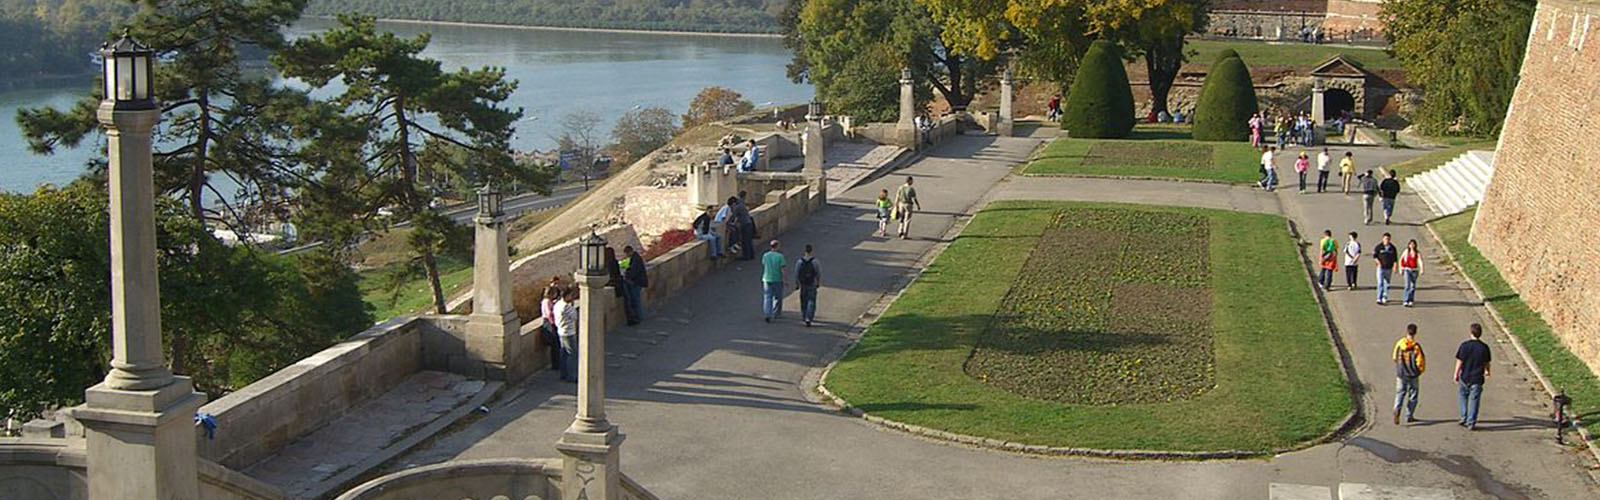 Concierge Belgrade   Kalemegdan park